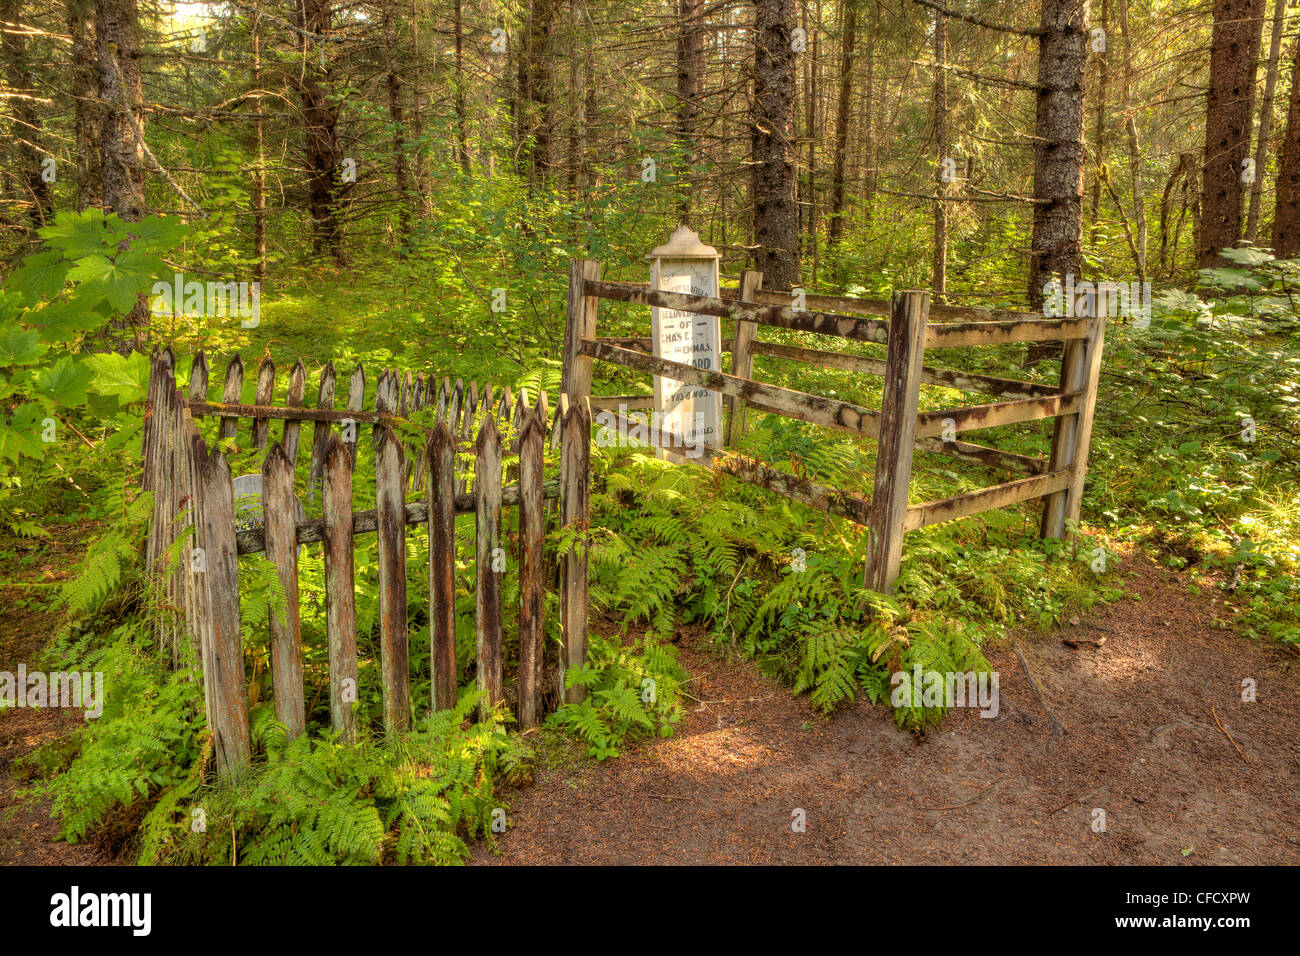 Old gravesites in Dyea, Skagway, Alaska, Canada. - Stock Image